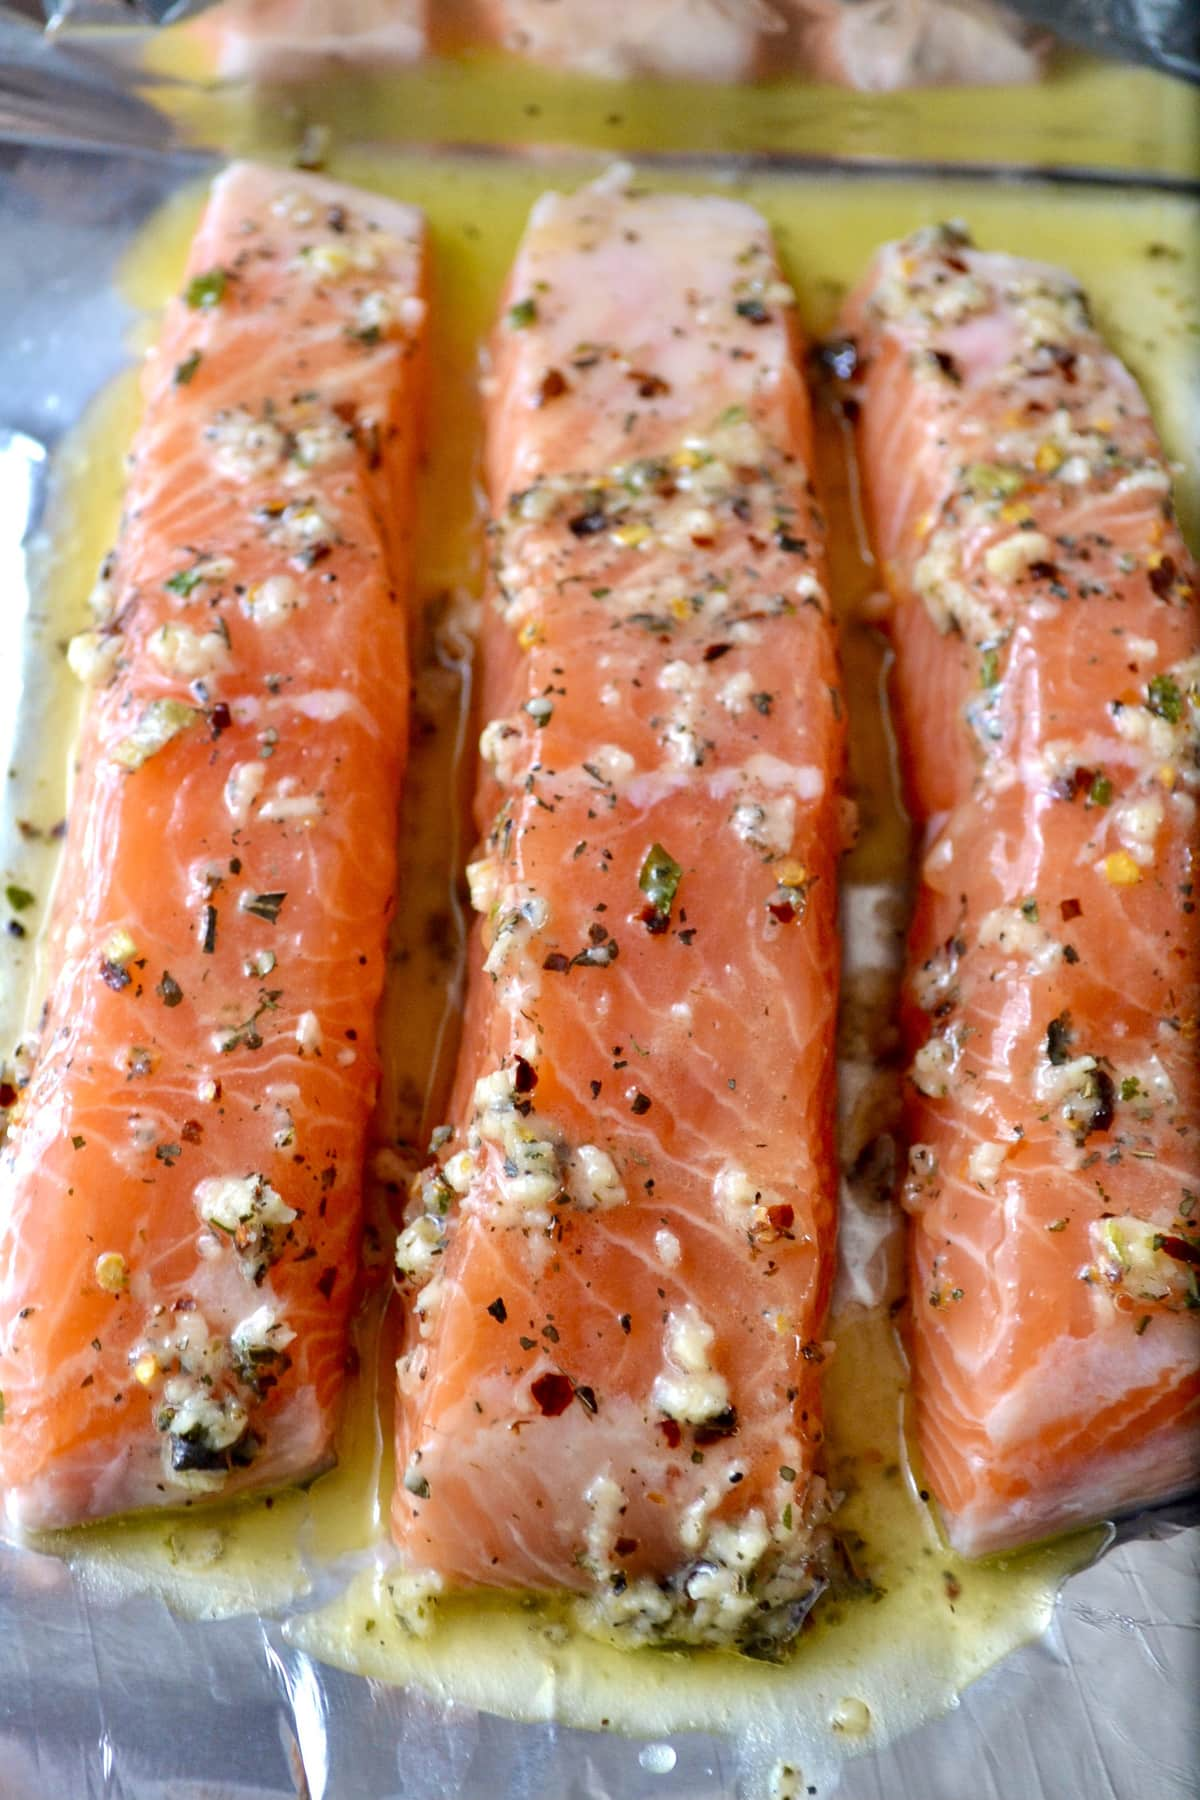 Keto Air Fryer Garlic Butter Salmon prep